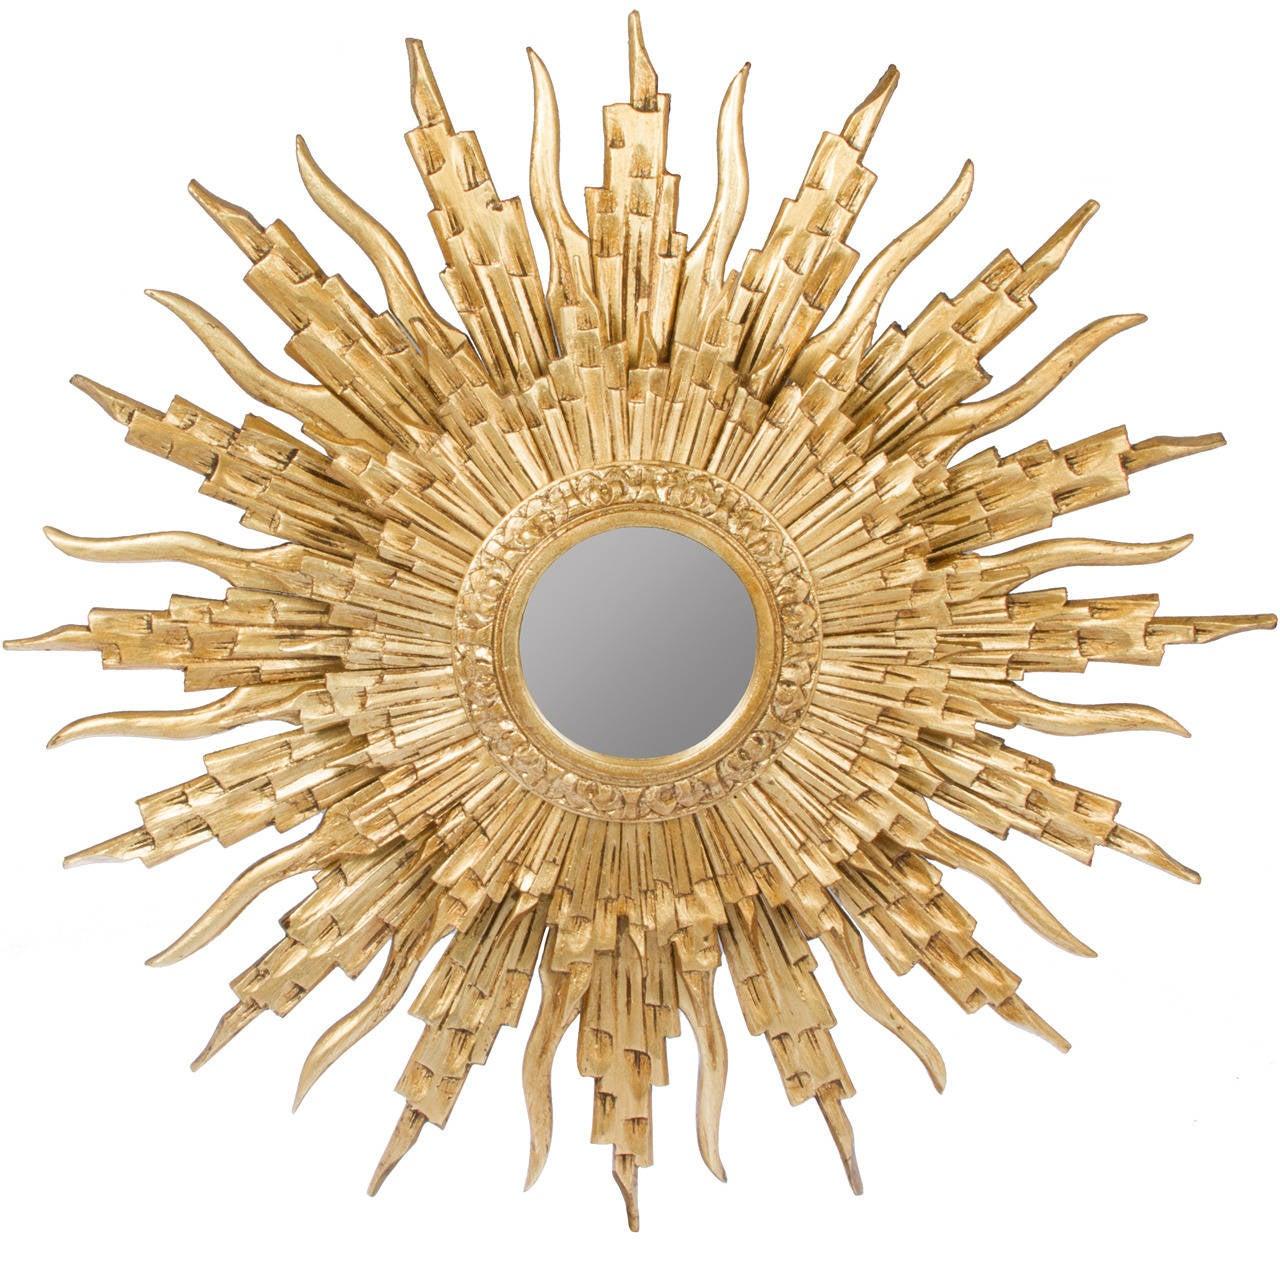 European gold gilt hand carved wood sunburst mirror at 1stdibs for Sunburst mirror